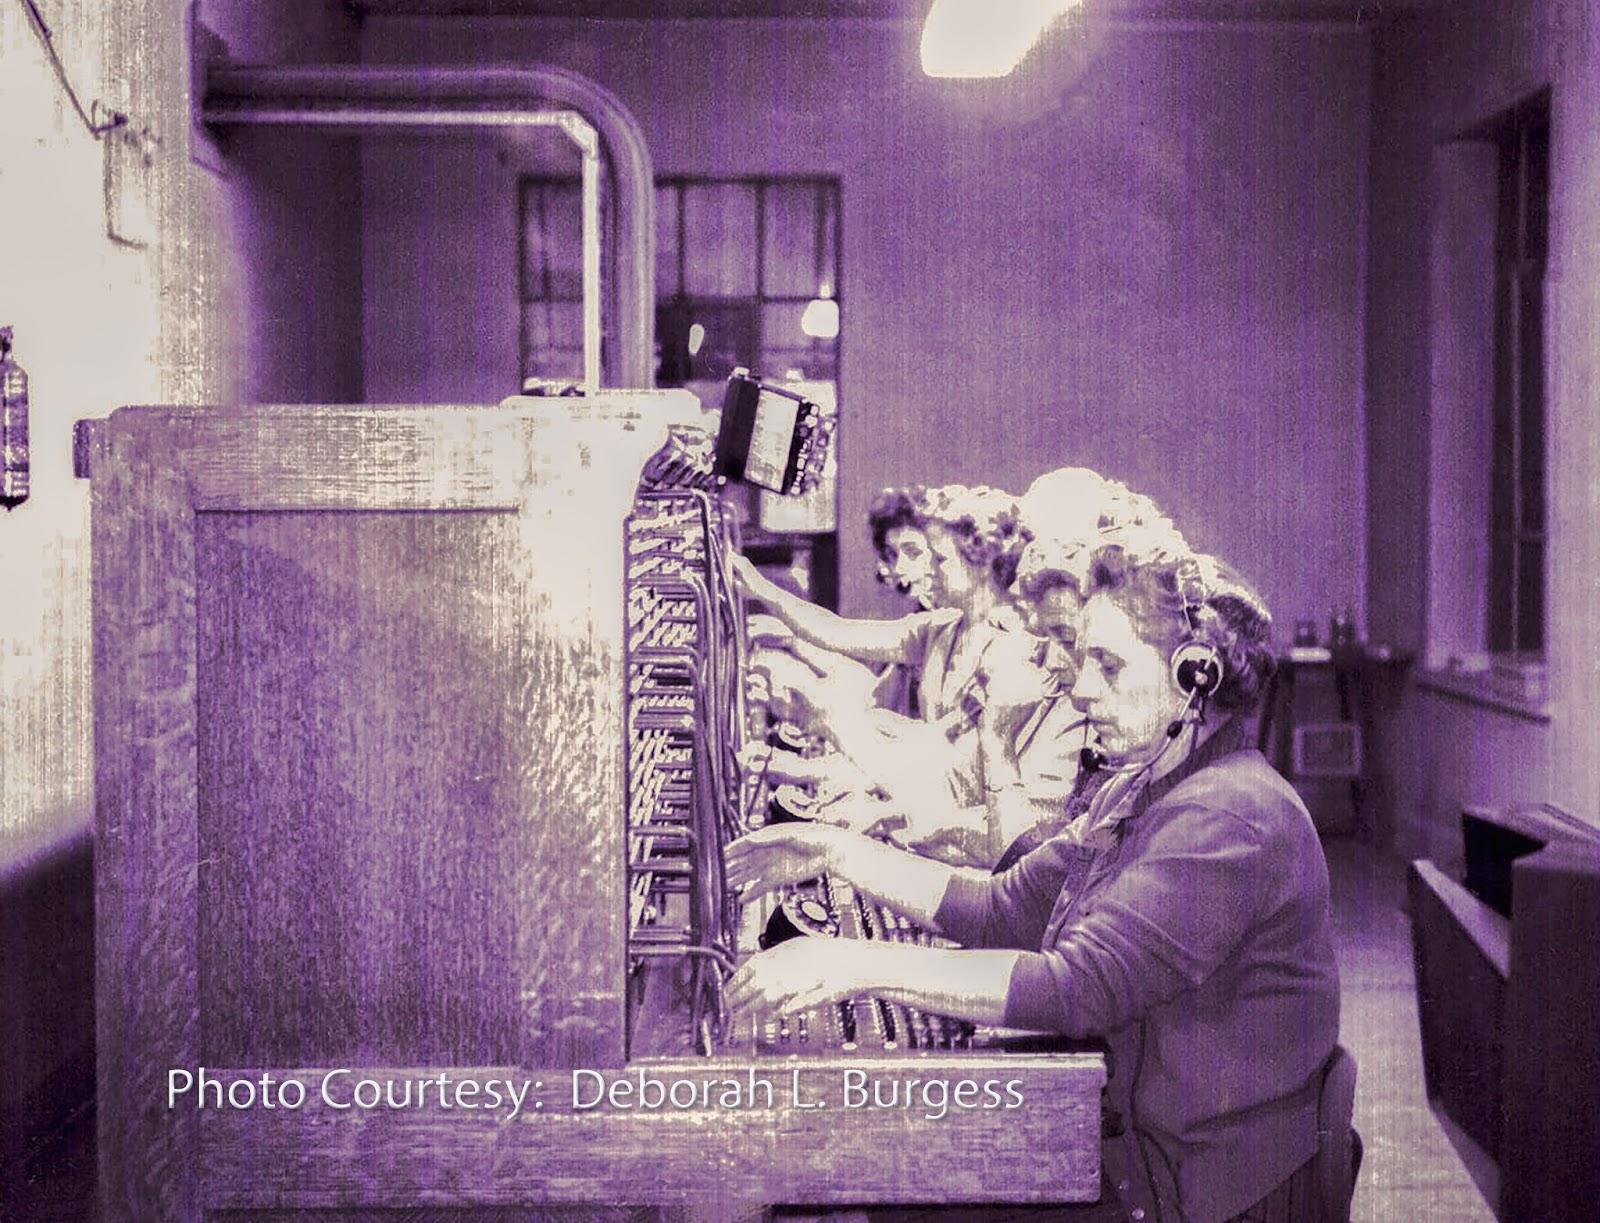 Switchboard Operator Resume hospital switchboard operator cover – Switchboard Operator Resume